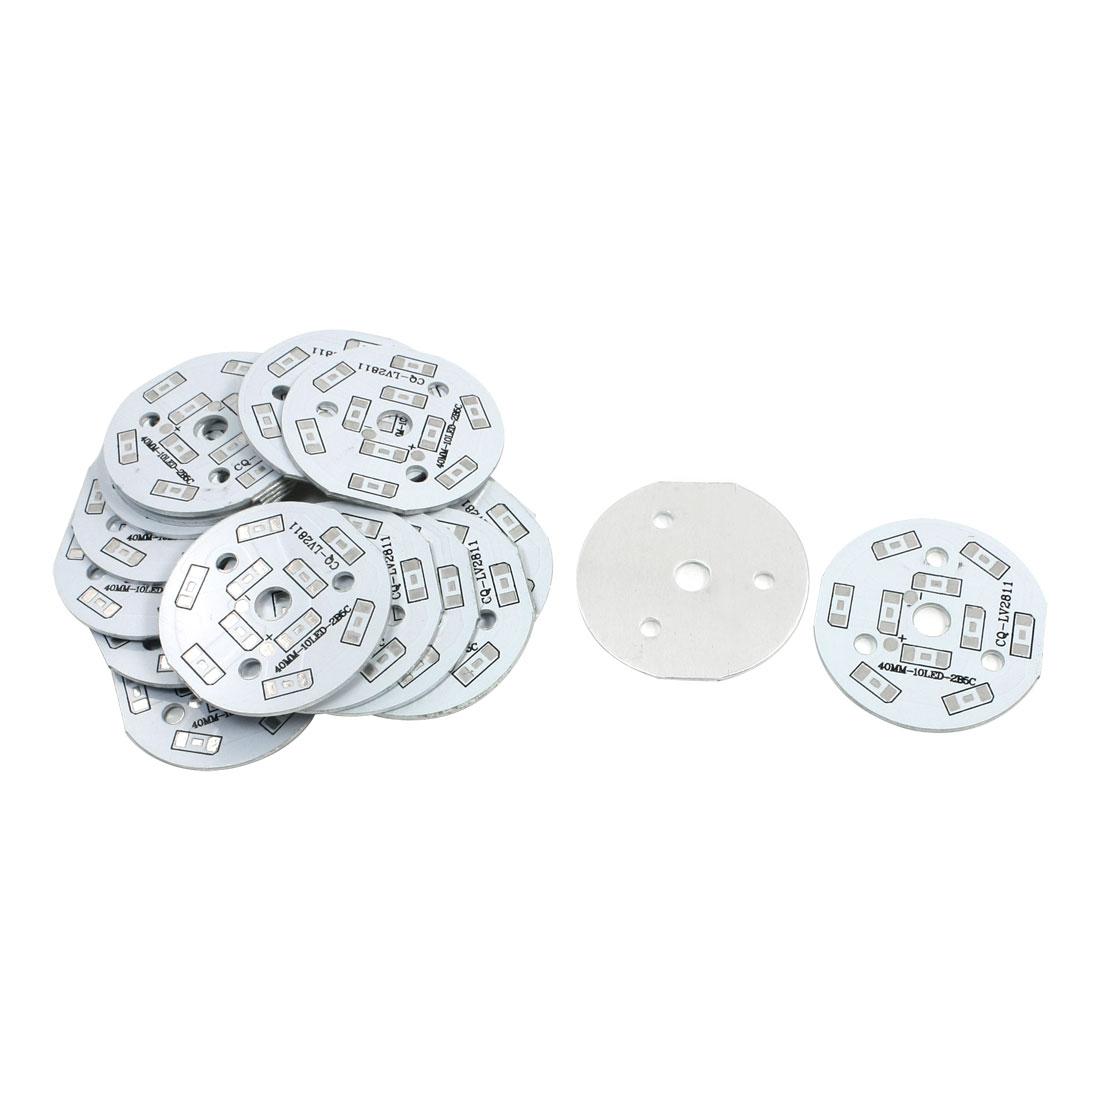 20Pcs 10 x 1/2W 5730 SMD LED High Power DIY Circle Aluminum PCB Circuit Board 40mm Diameter